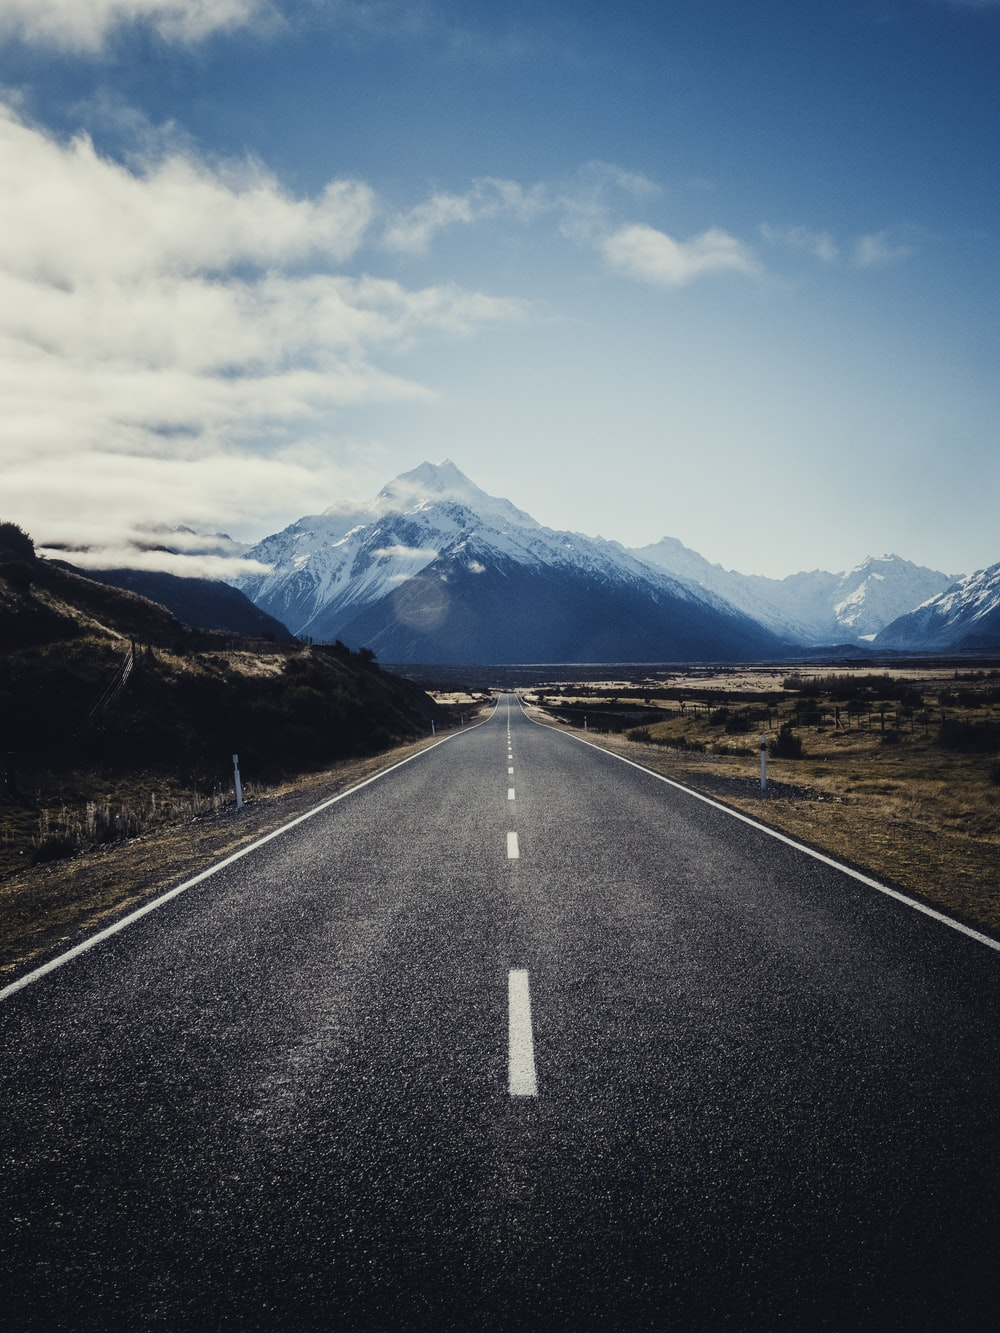 road near mountain during daytime